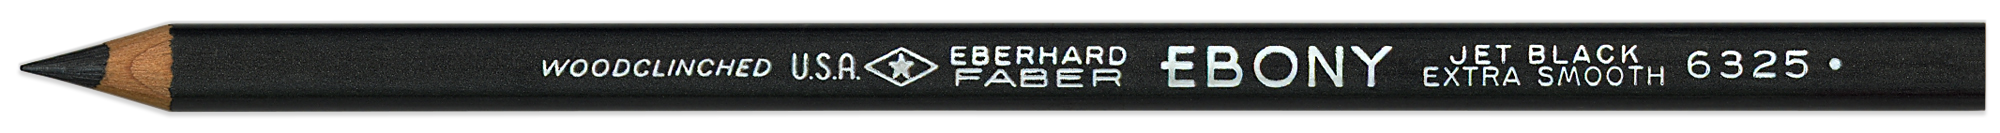 Ebony pencil by Eberhard Faber